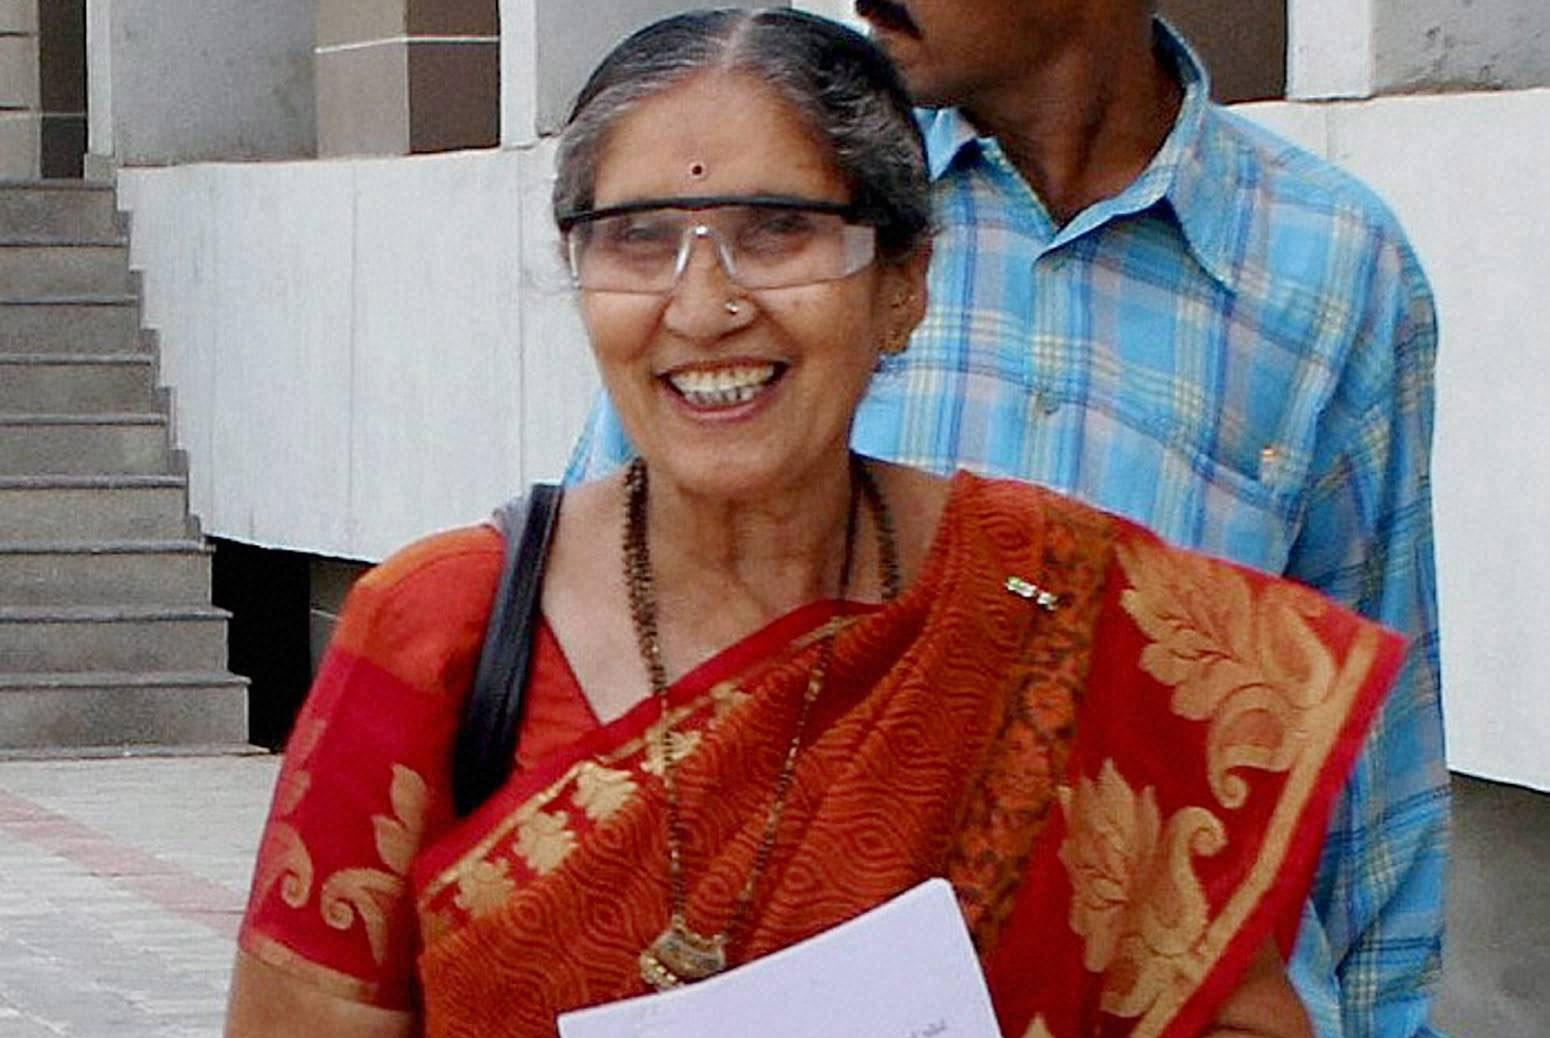 Prime Minister Narendra Modi's wife Jashodaben happy with demonetisation